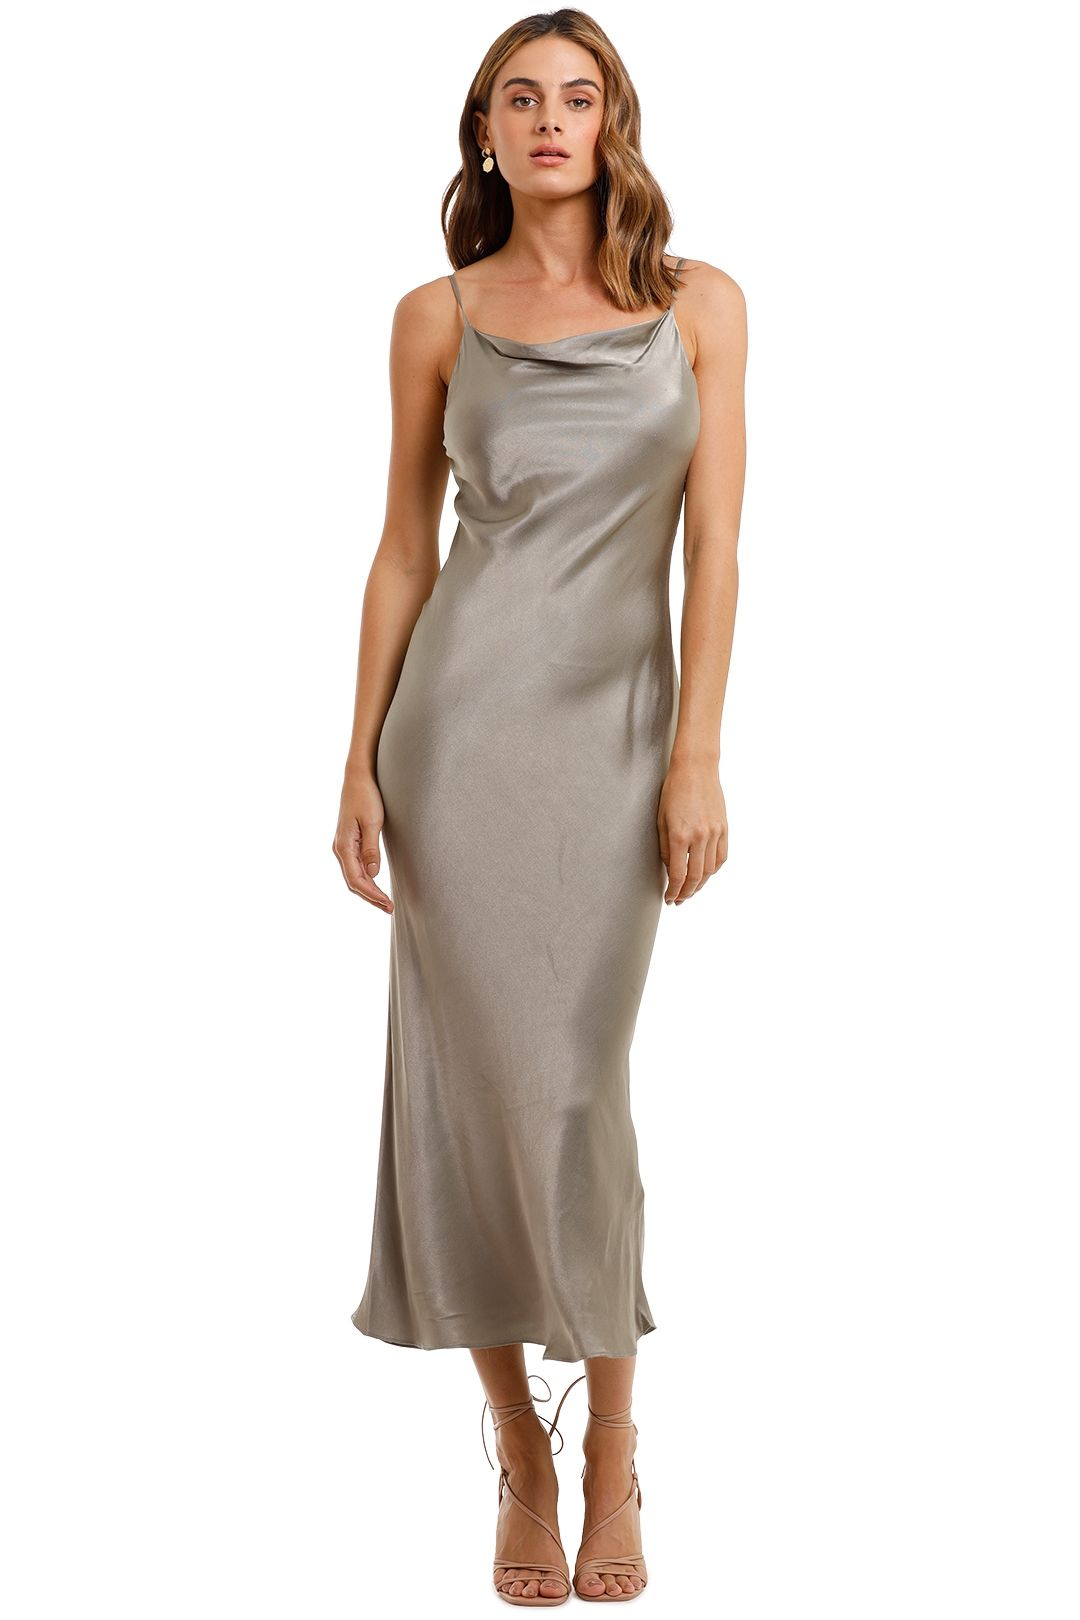 Shona Joy Bias Cowl Midi Dress Sage